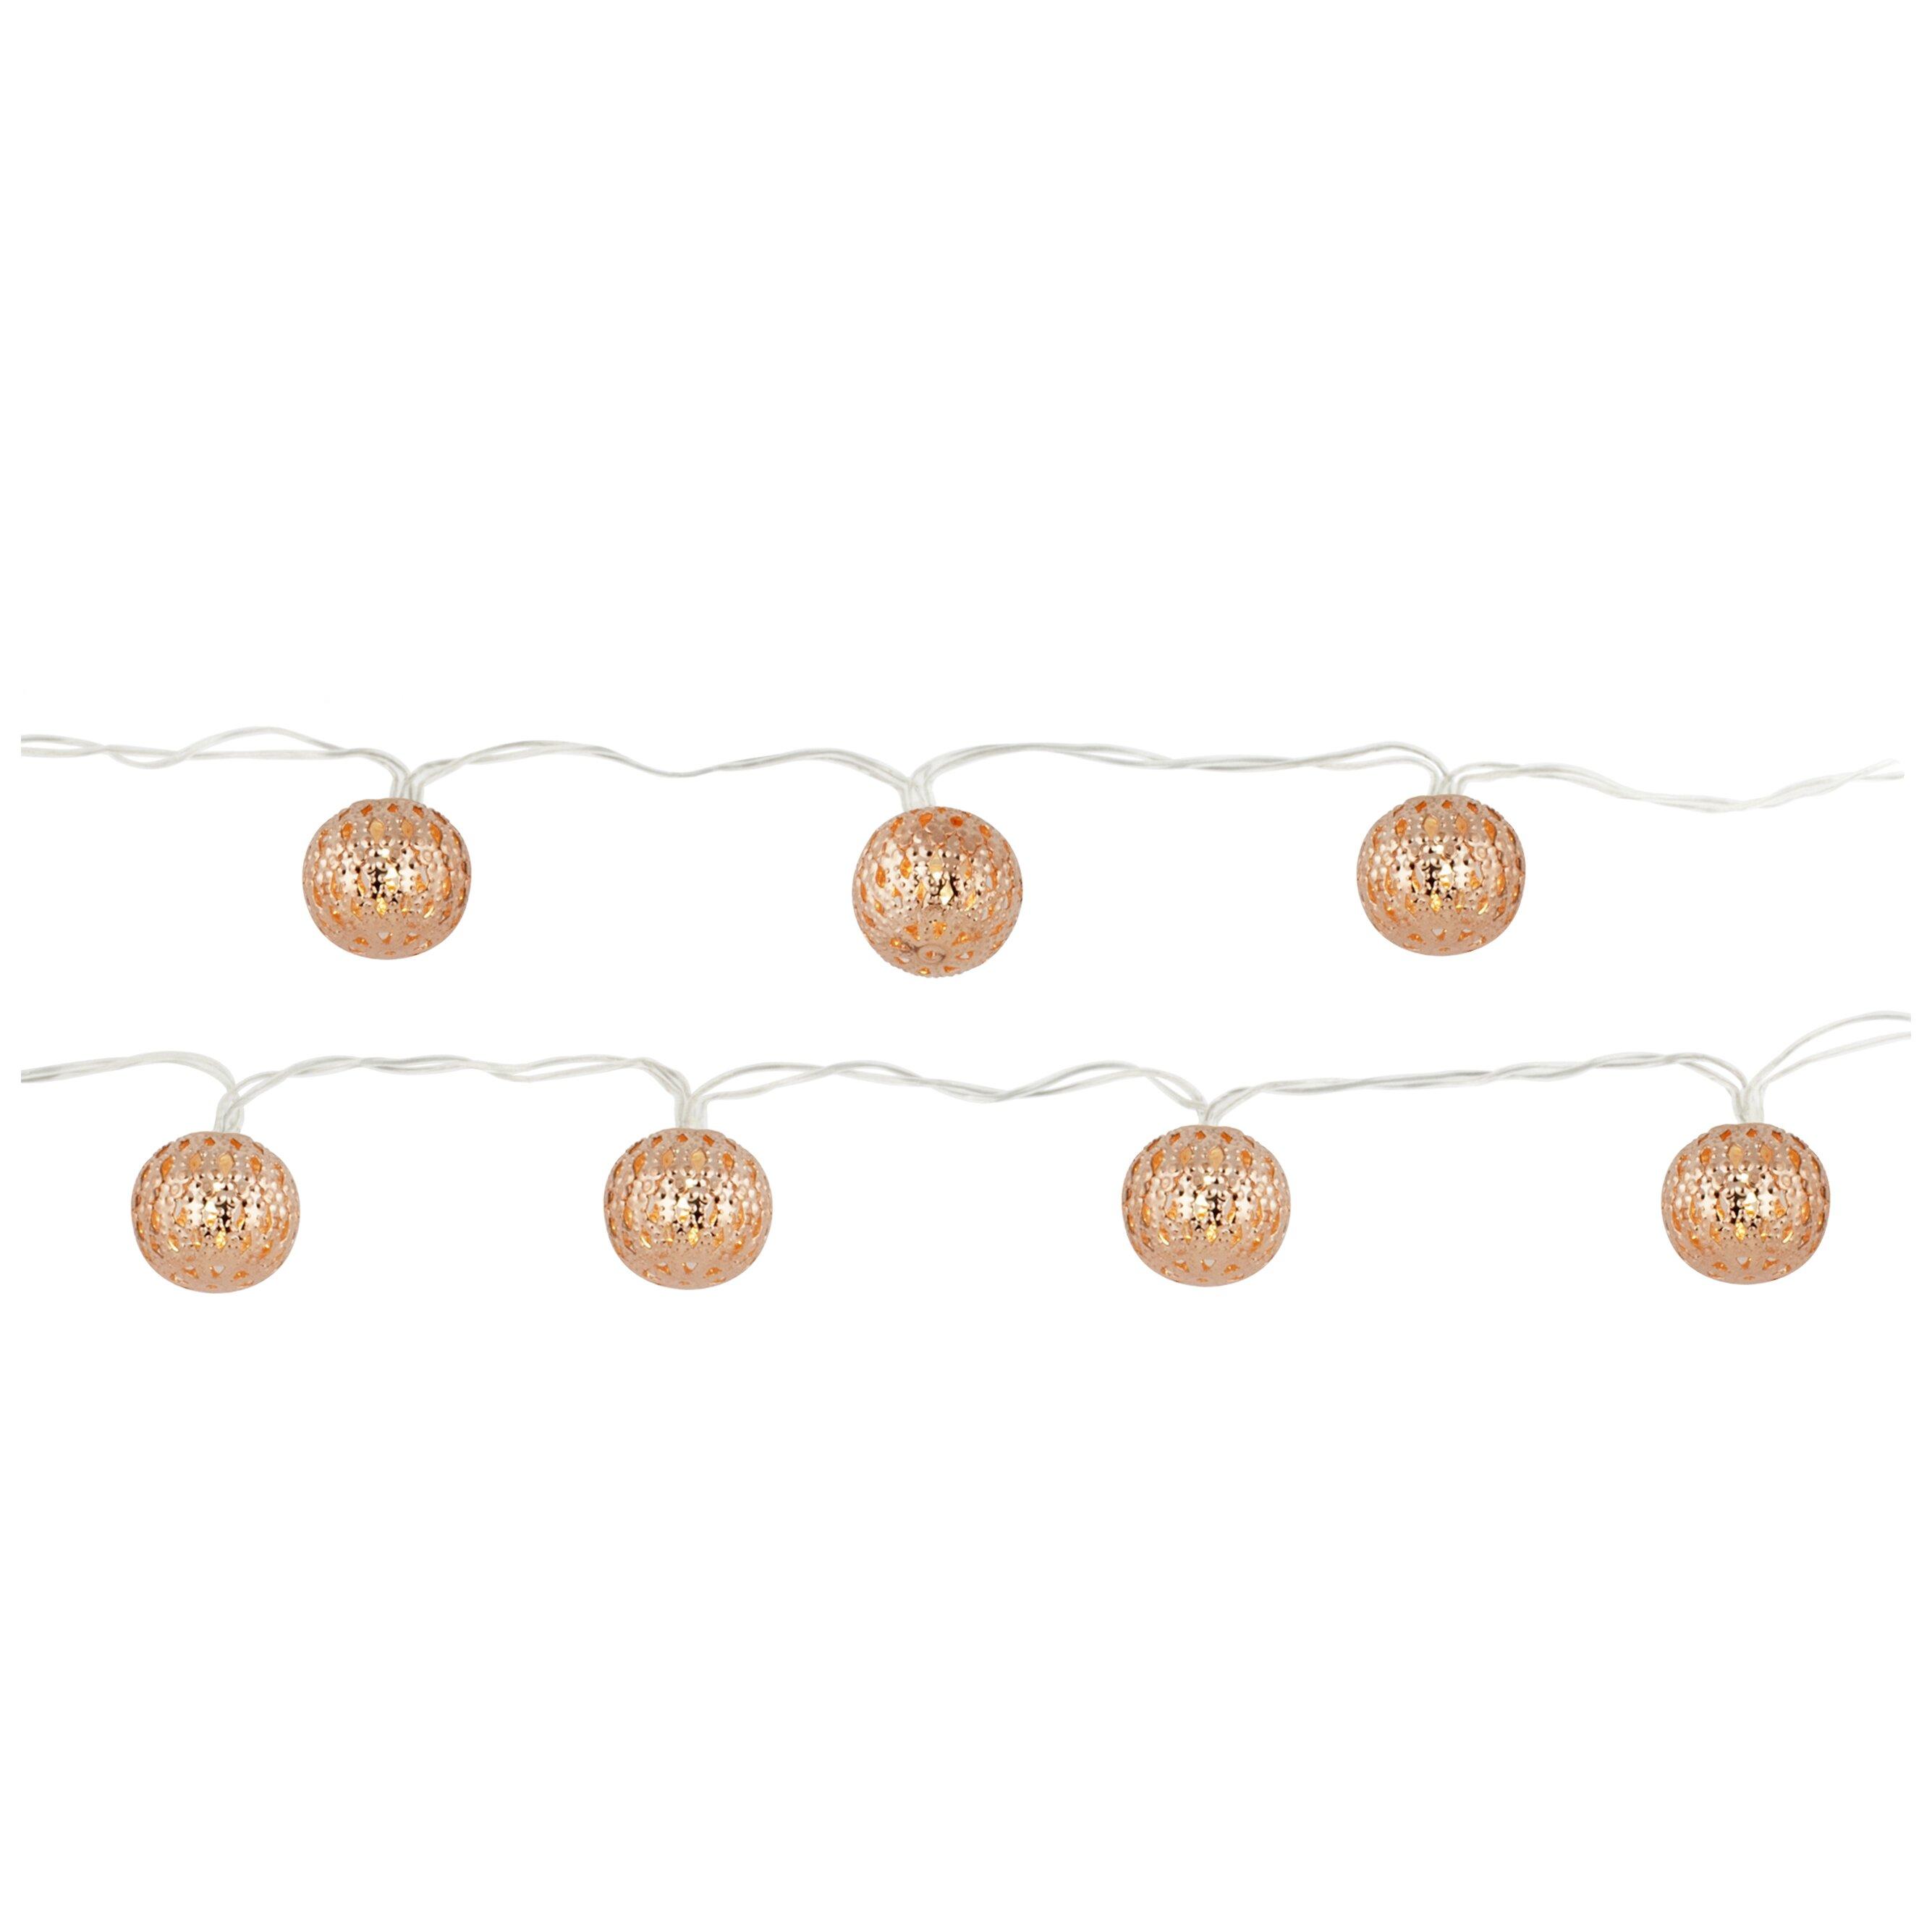 Kikkerland 10-Light Globe String Lights & Reviews Wayfair.ca